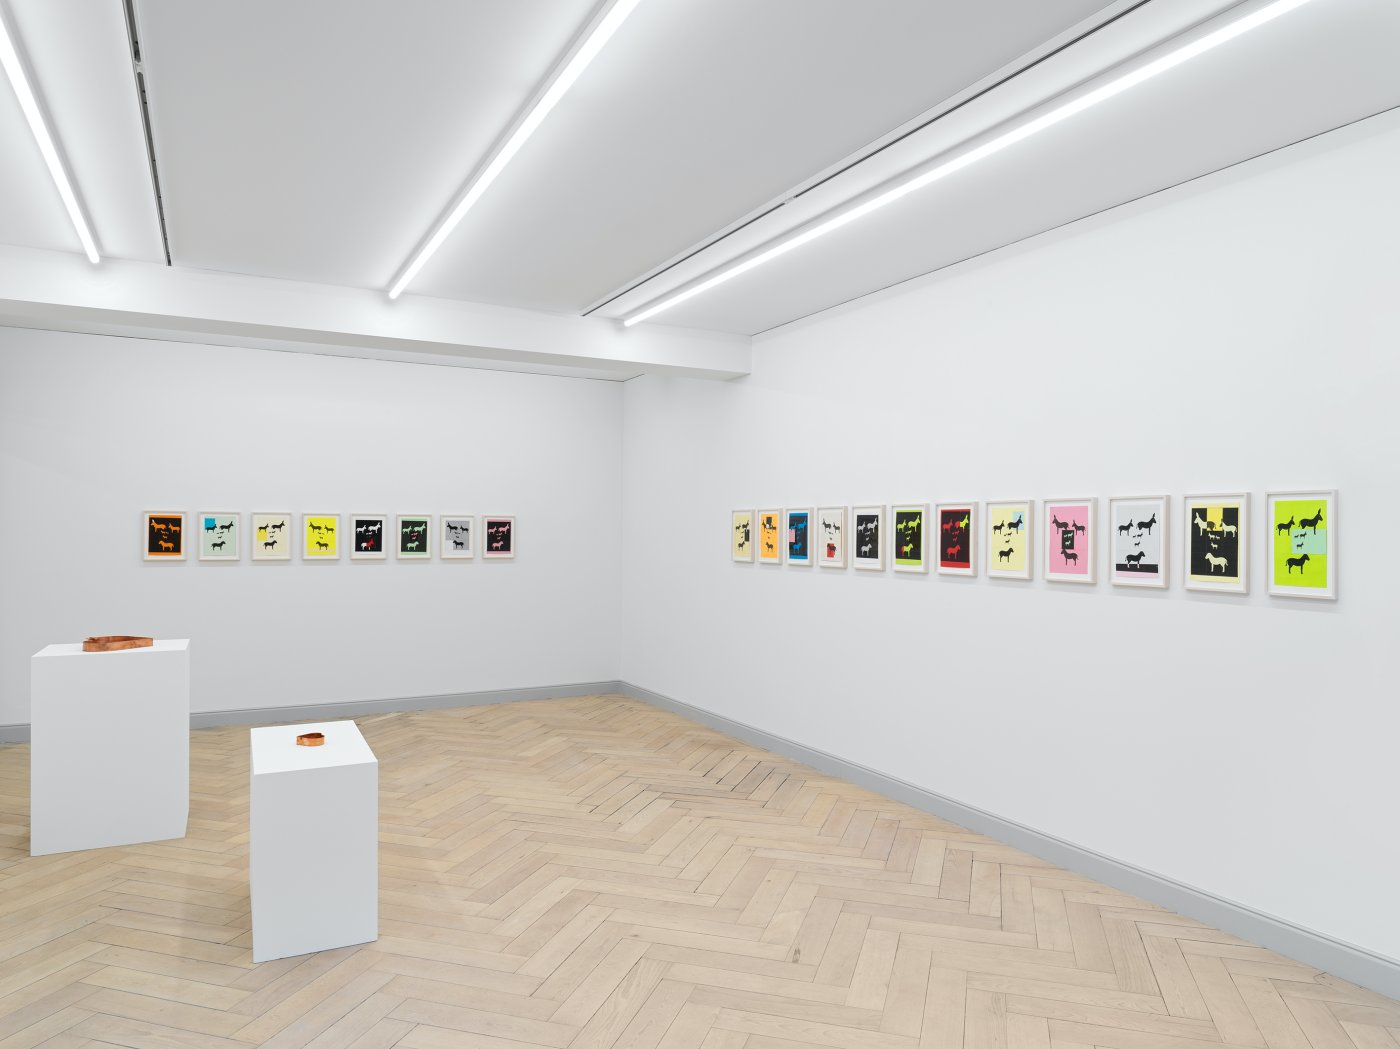 Galerie Eva Presenhuber Valentin Carron 2020 5